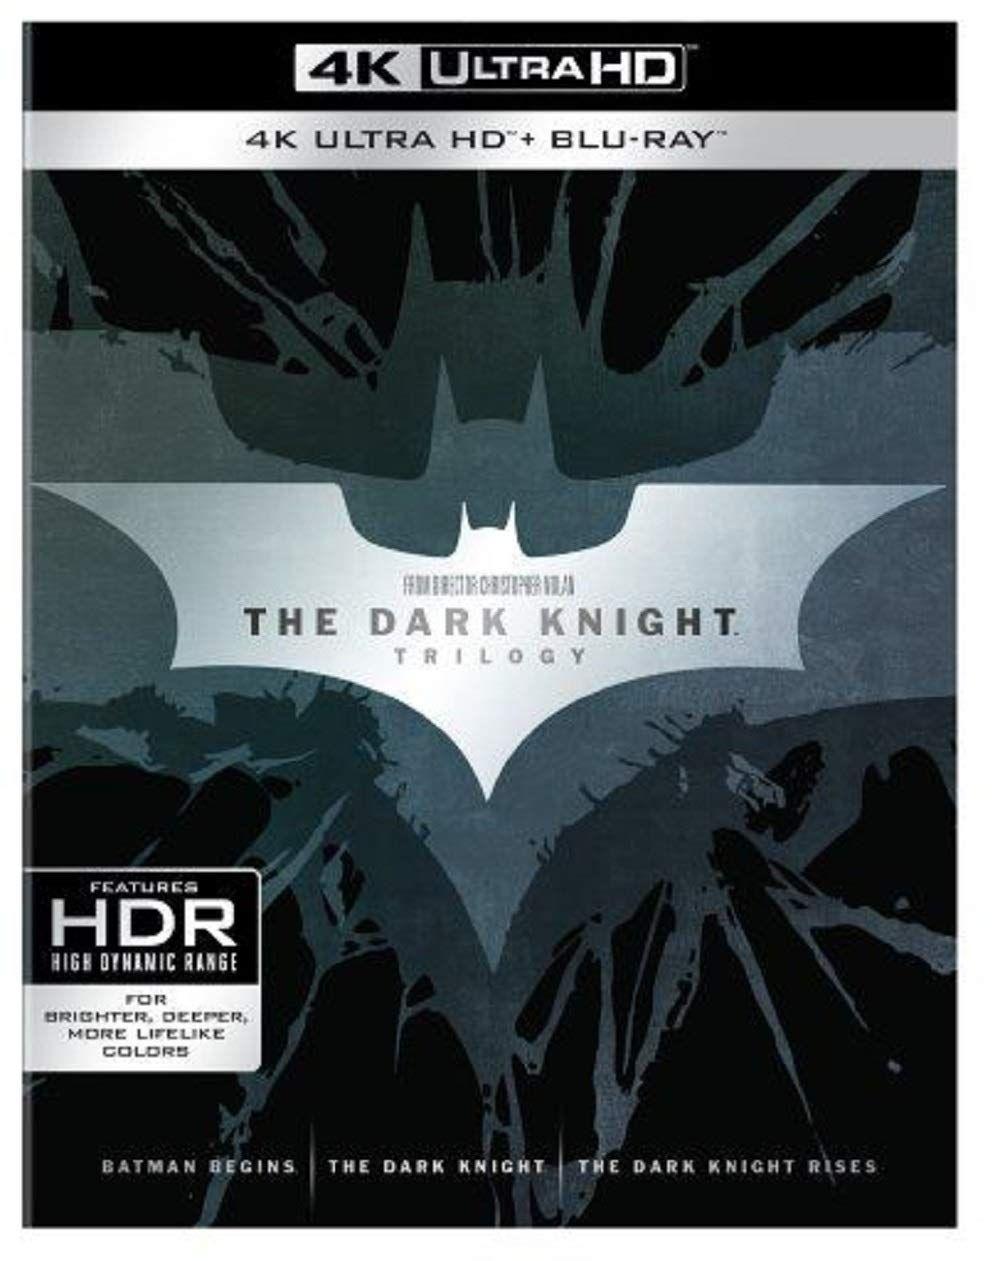 Dark Knight Trilogy 4K - Prime Day £26.59 @ Amazon